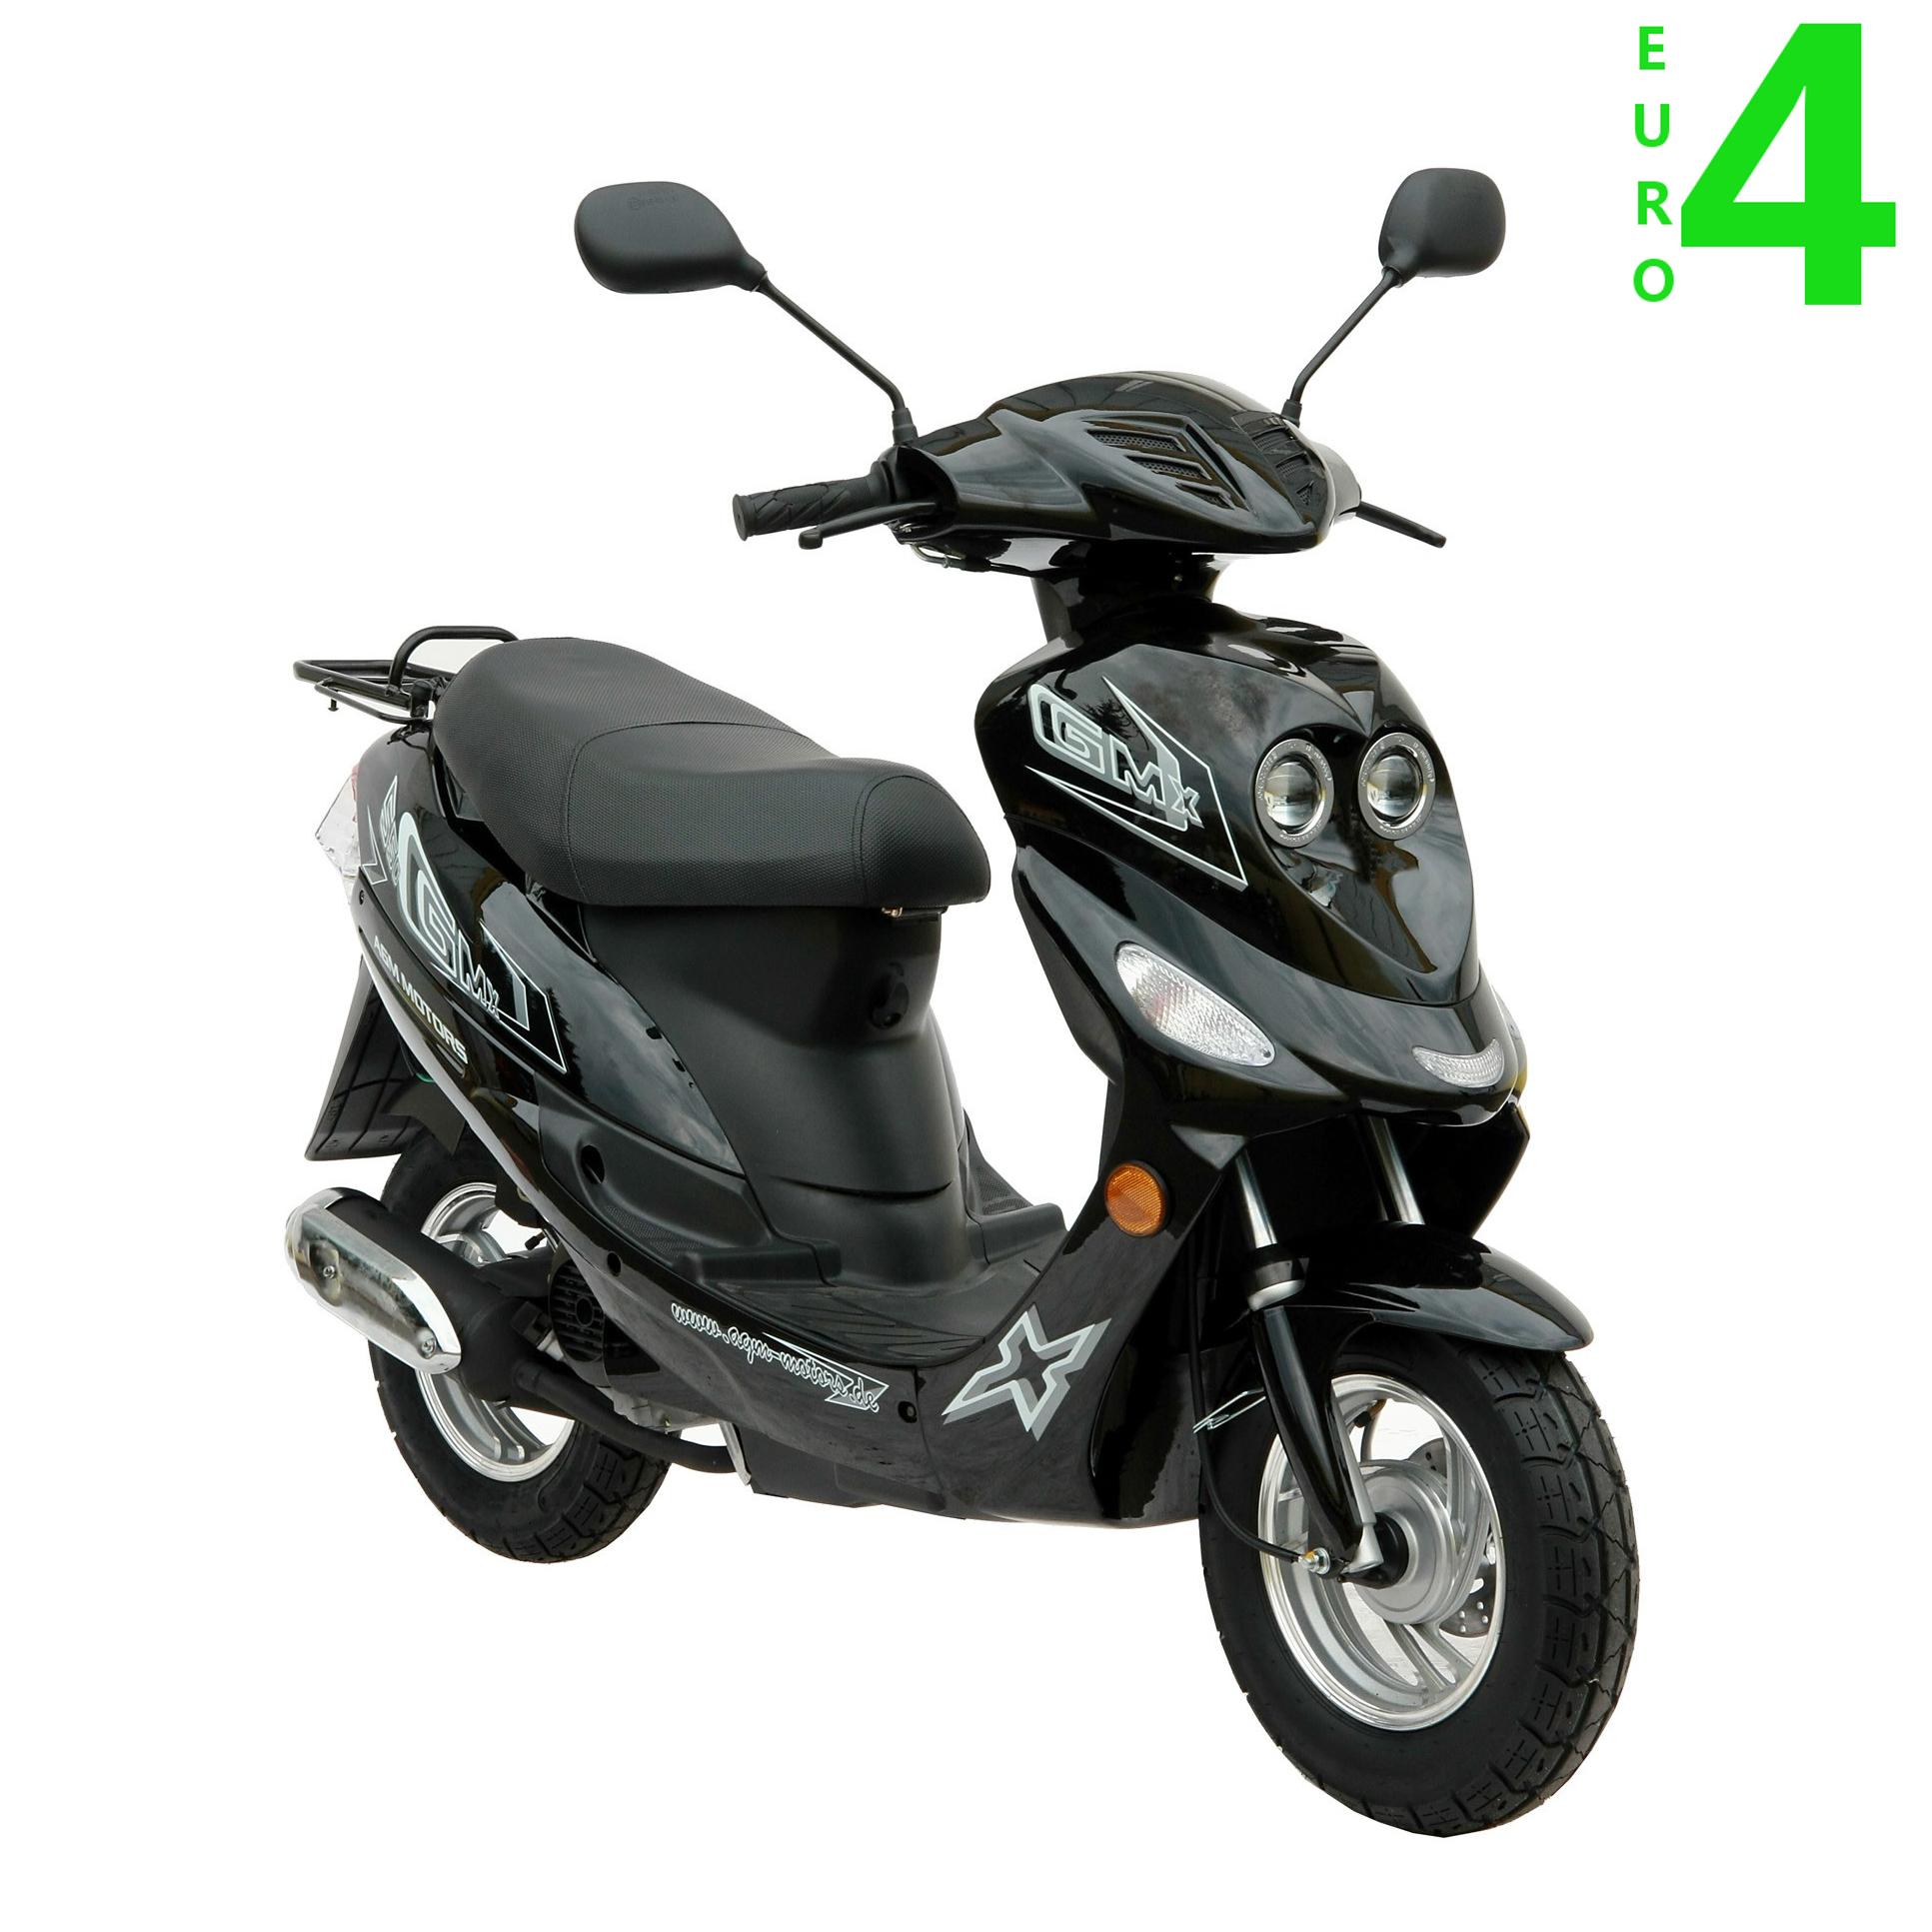 gmx 550 motorroller scooter mofa 25 km h schwarz euro 4. Black Bedroom Furniture Sets. Home Design Ideas